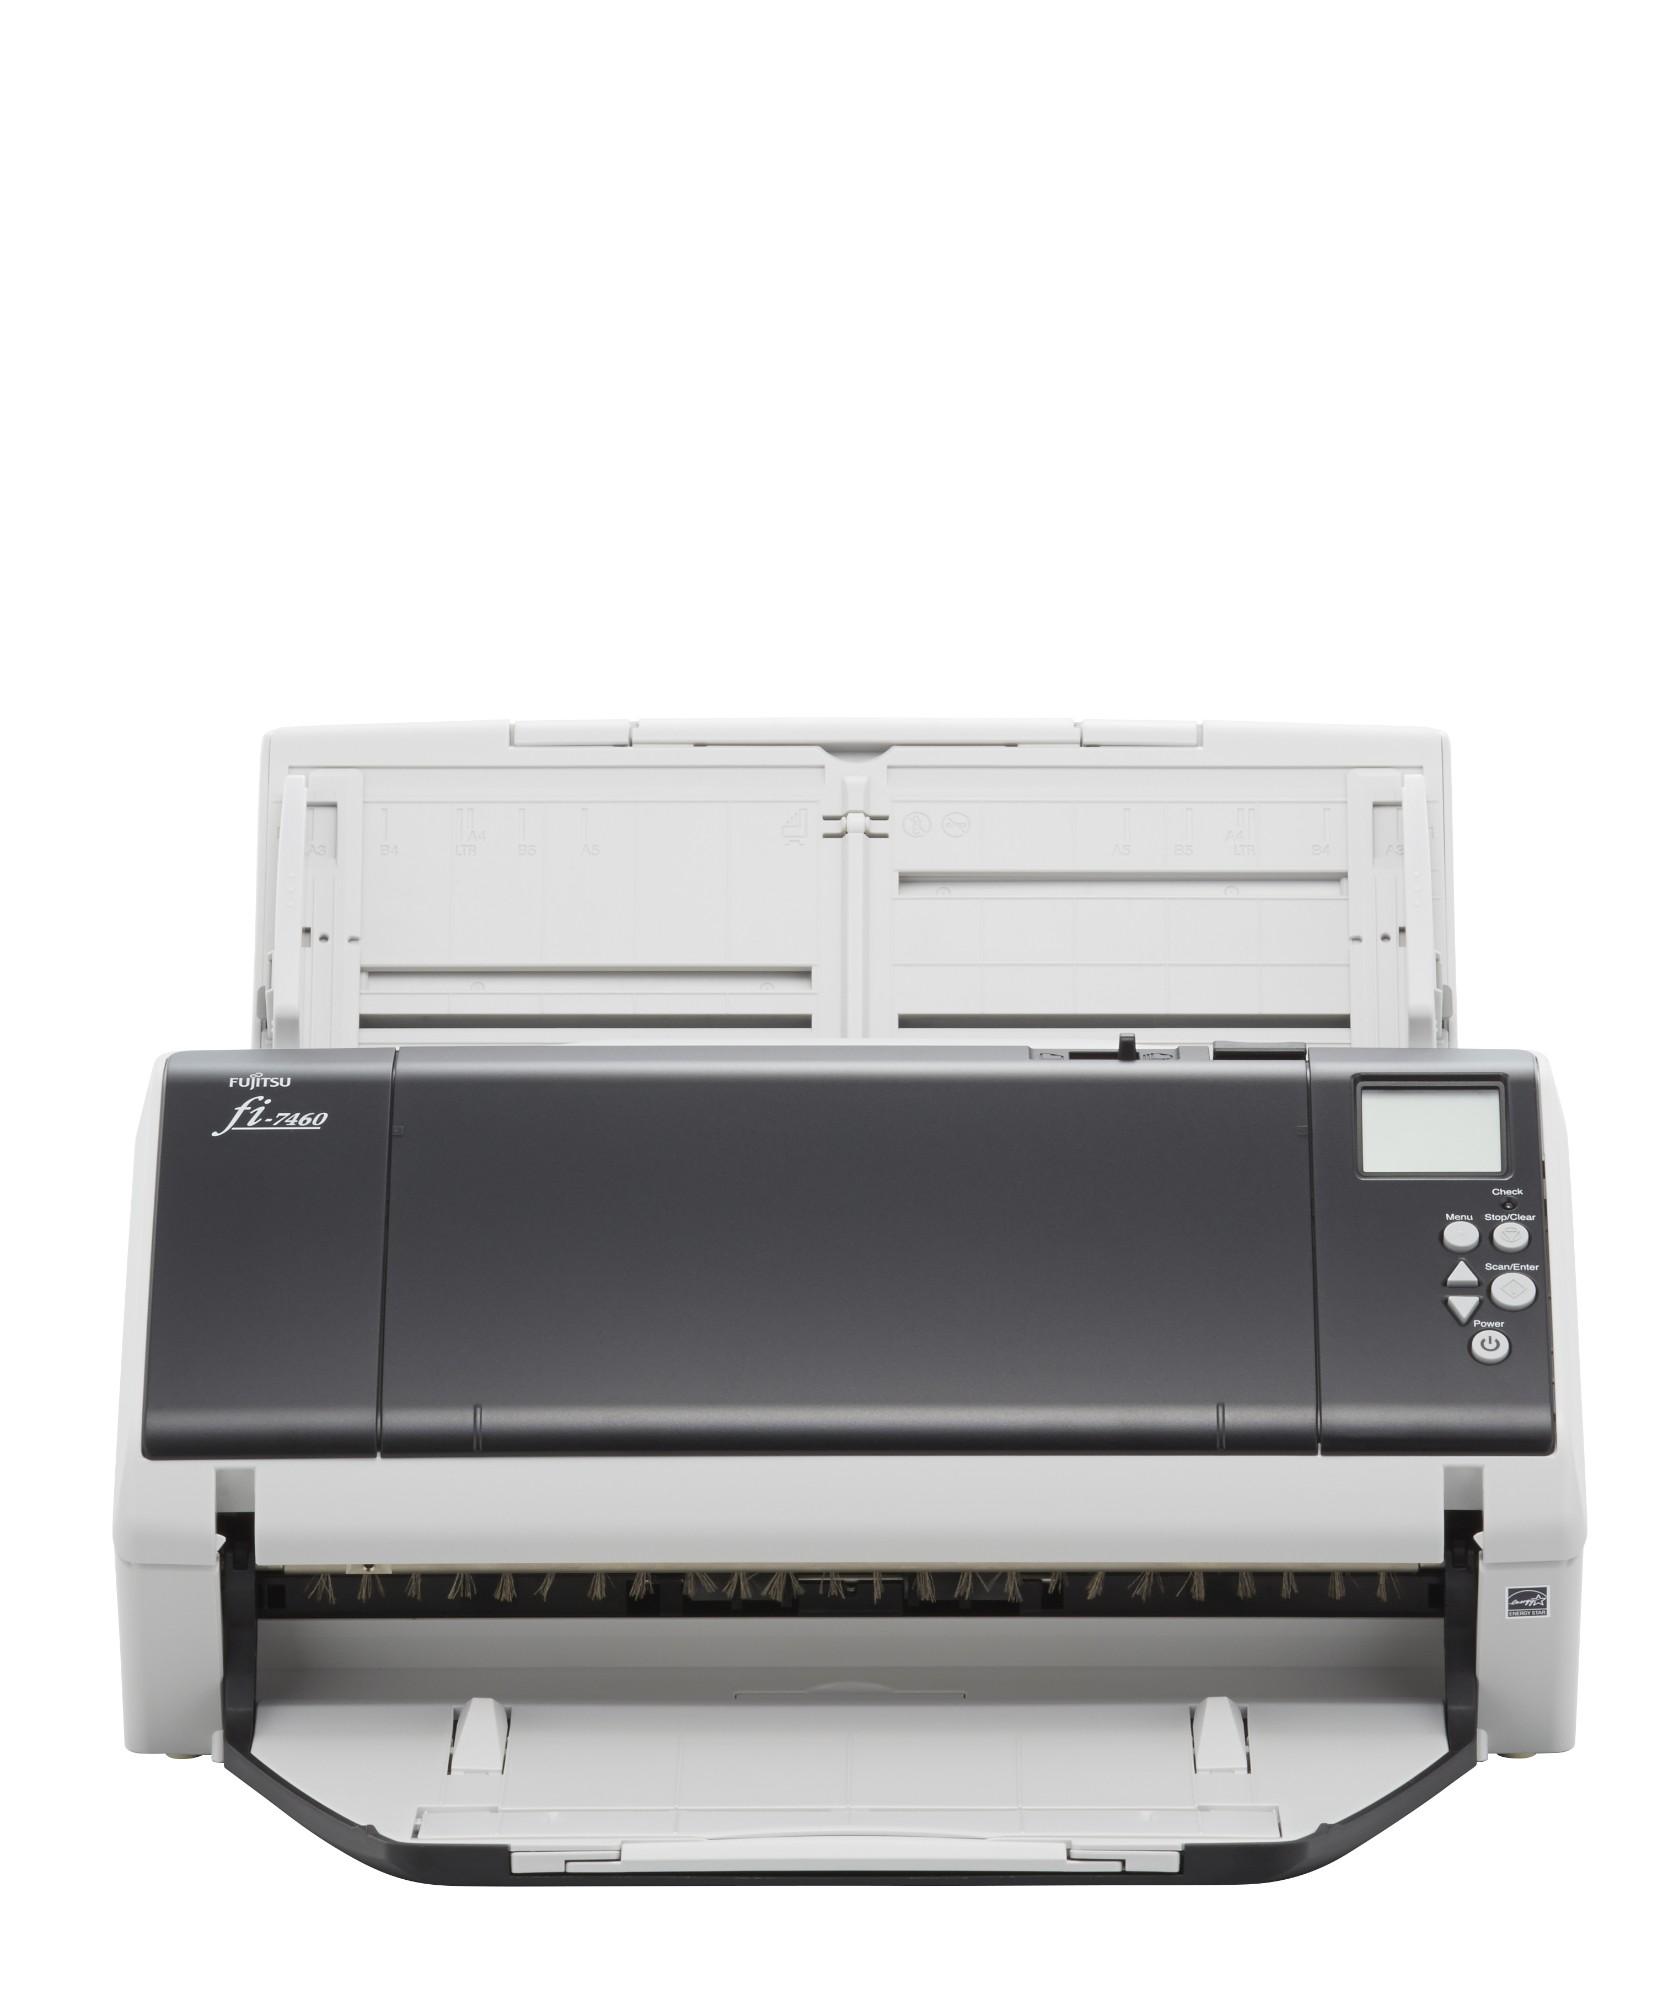 Fujitsu fi-7460 ADF scanner 600 x 600DPI A4 Grey,White